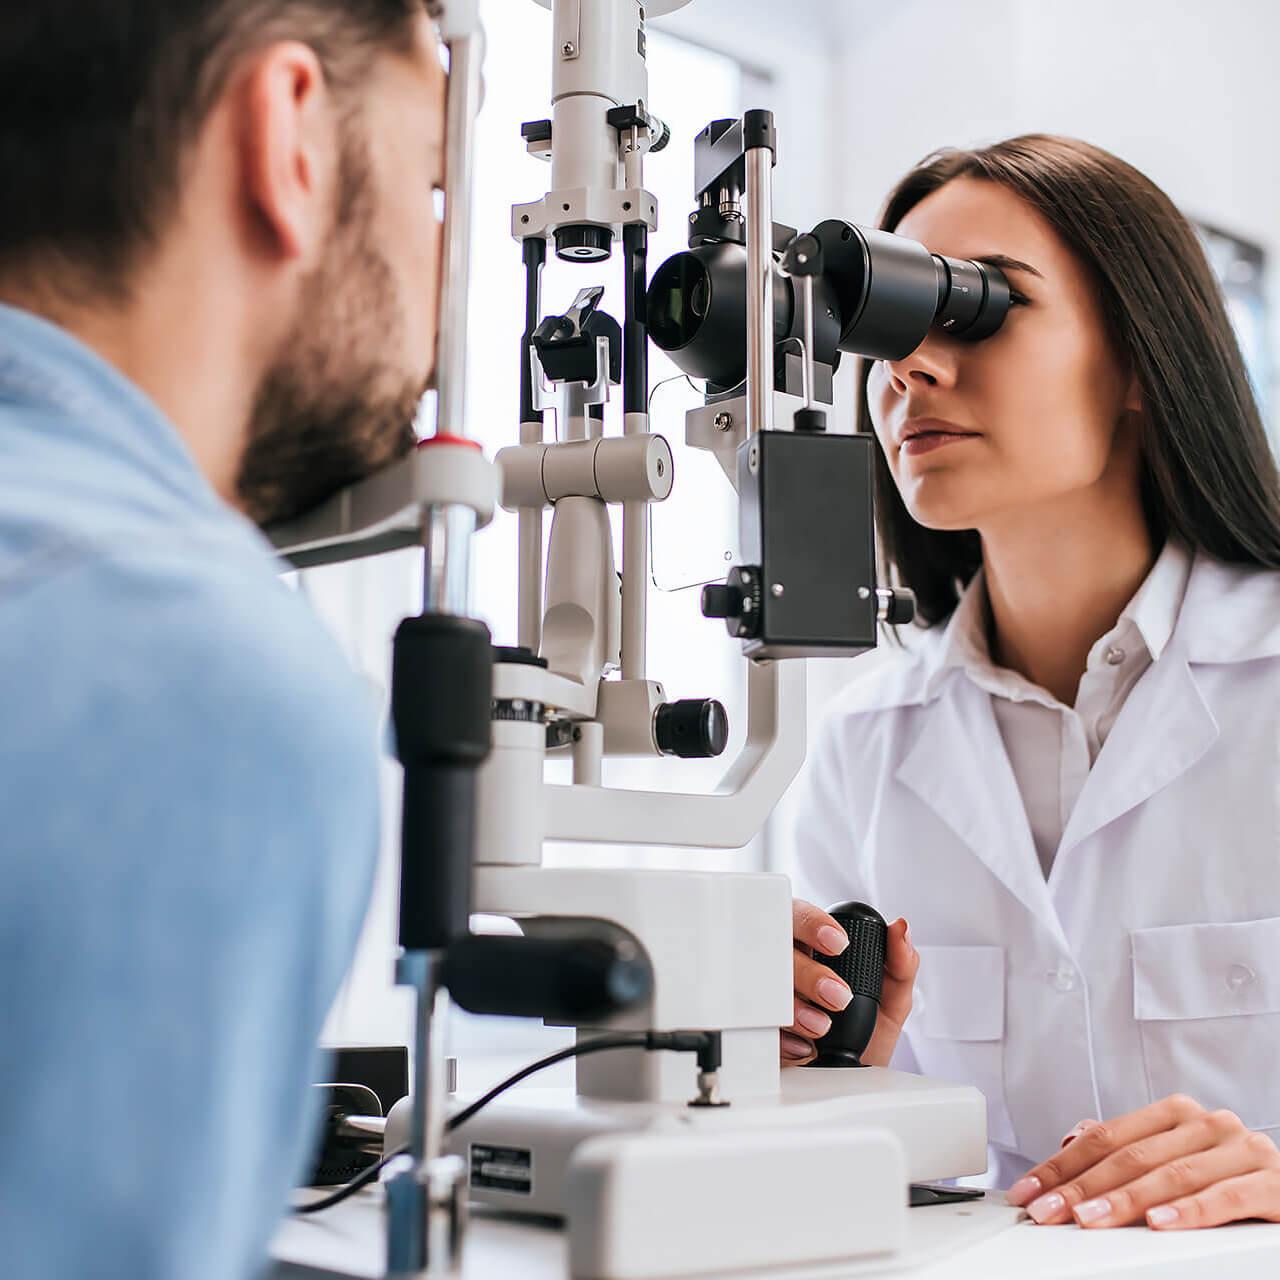 CSI Dry Eye Software